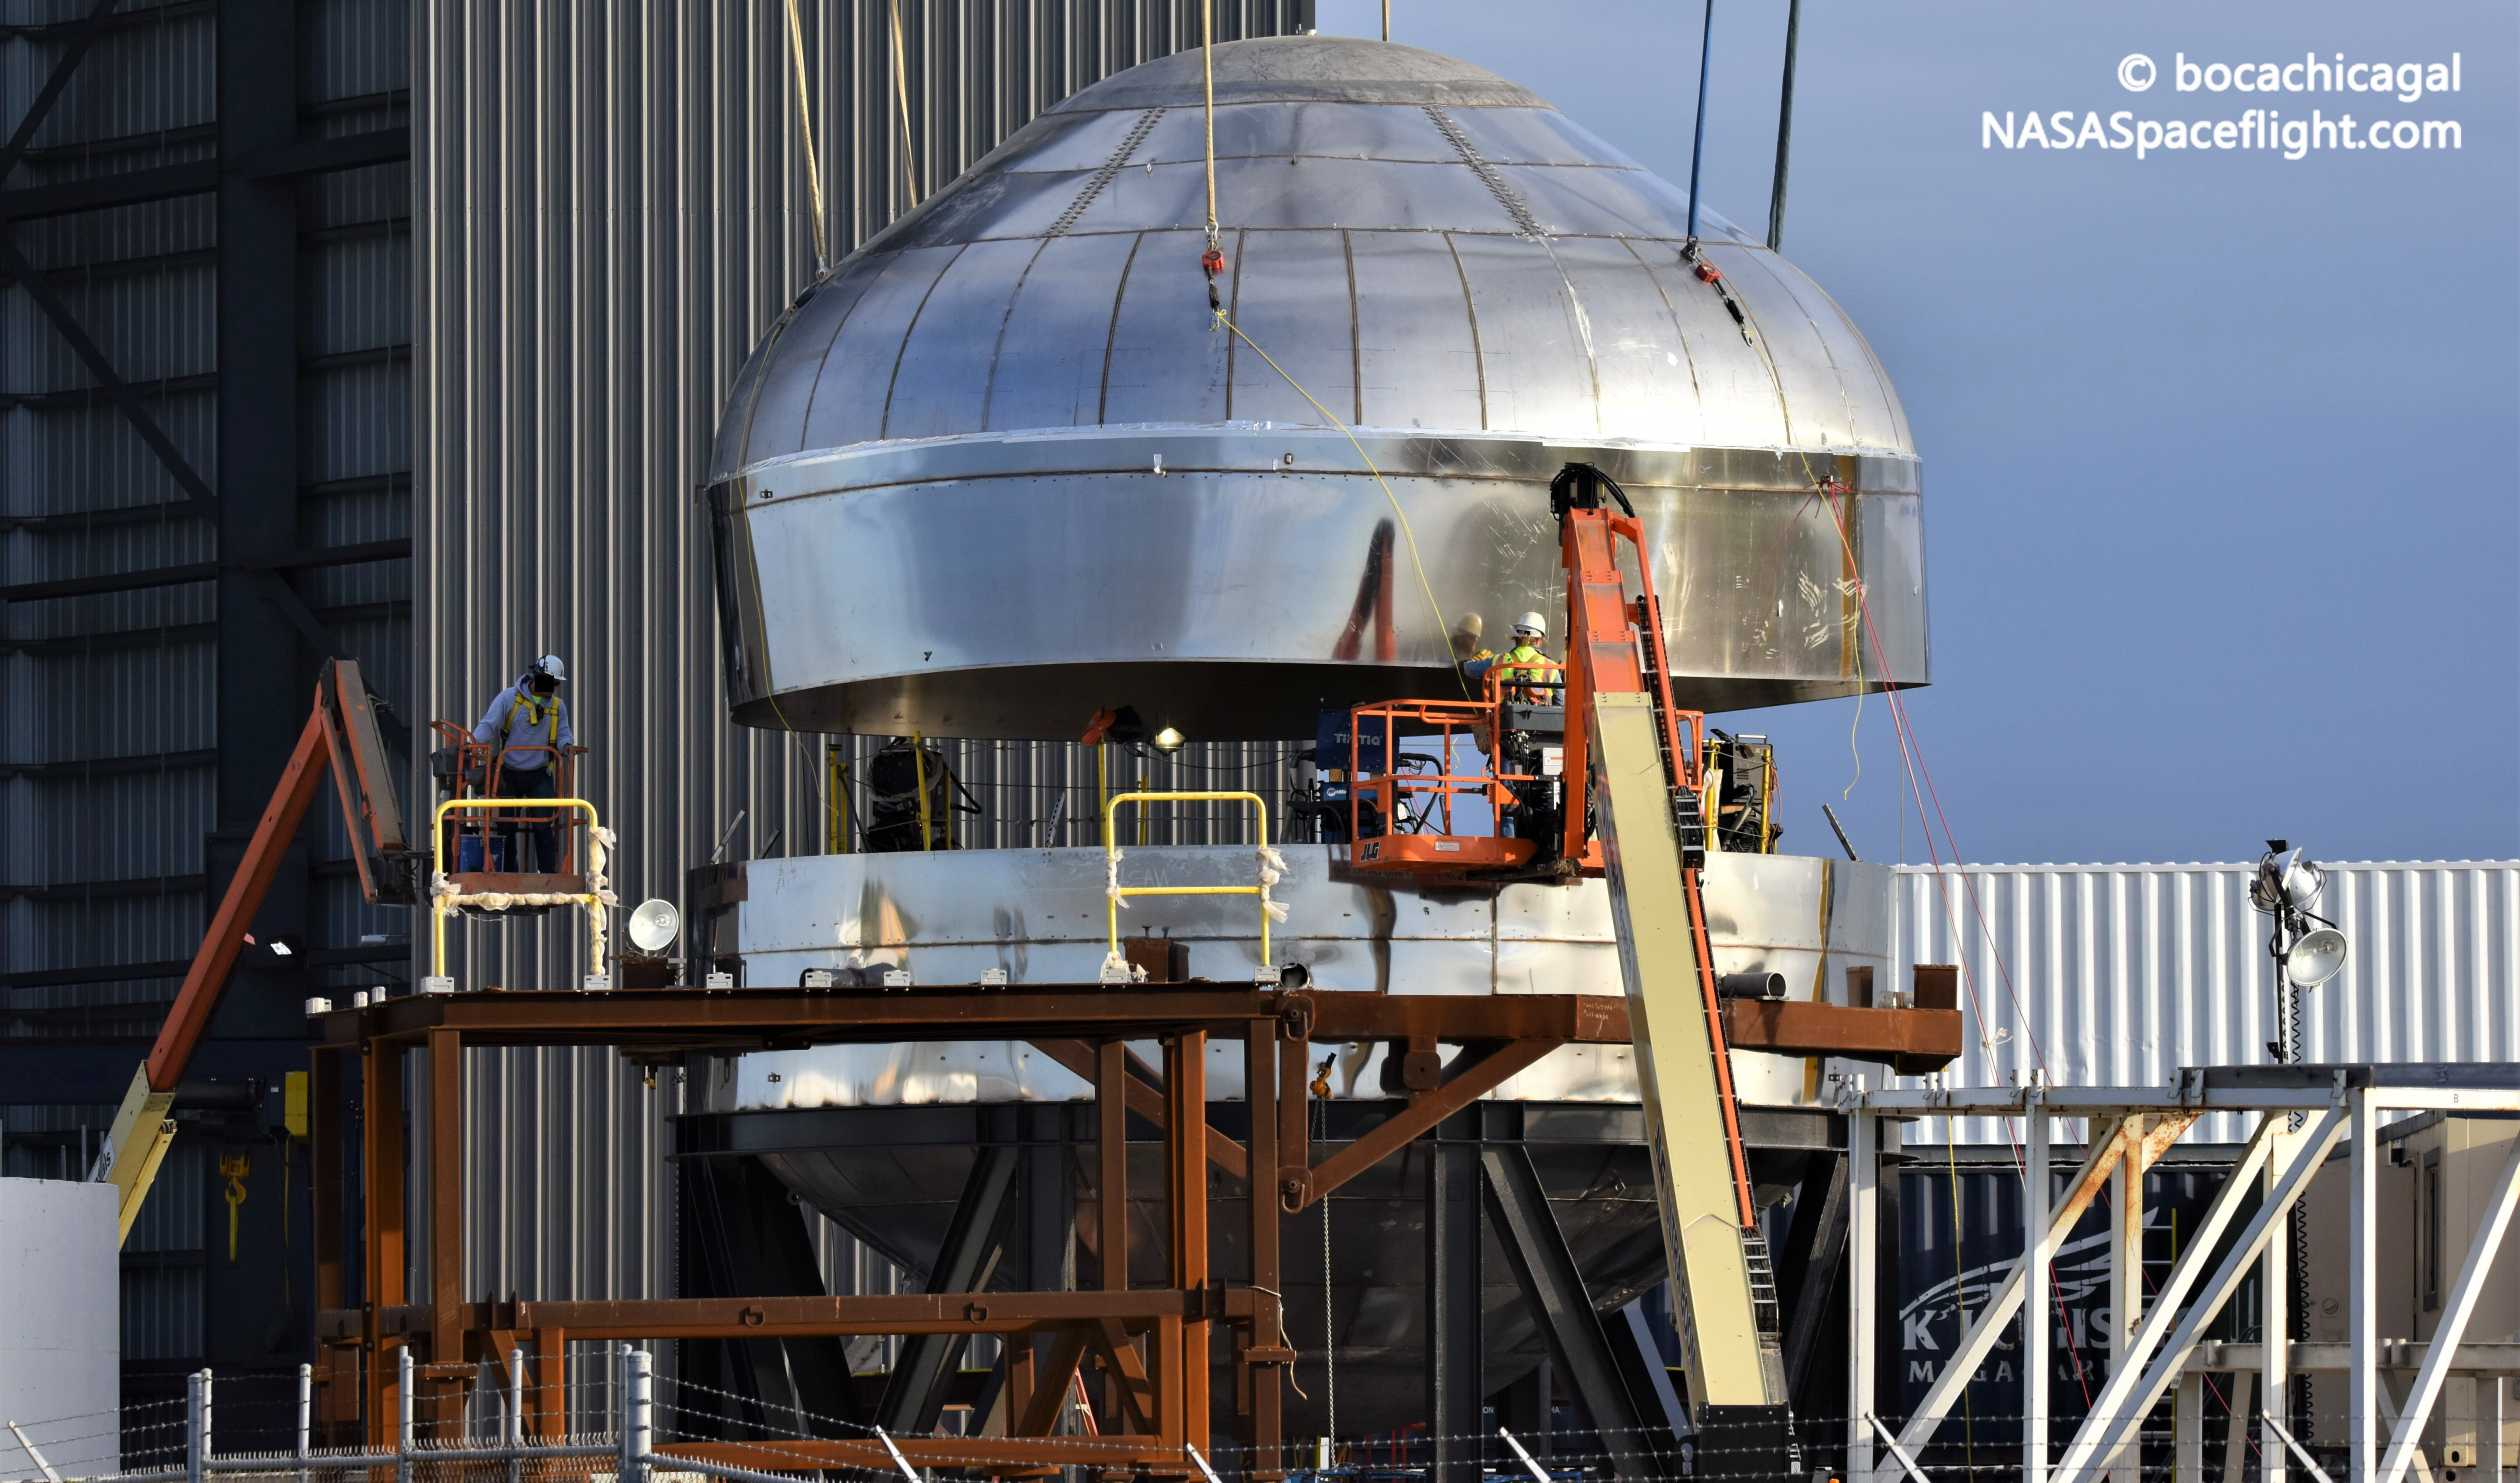 Starship Boca Chica 010720 (NASASpaceflight – bocachicagal) test tank 8 crop (c)